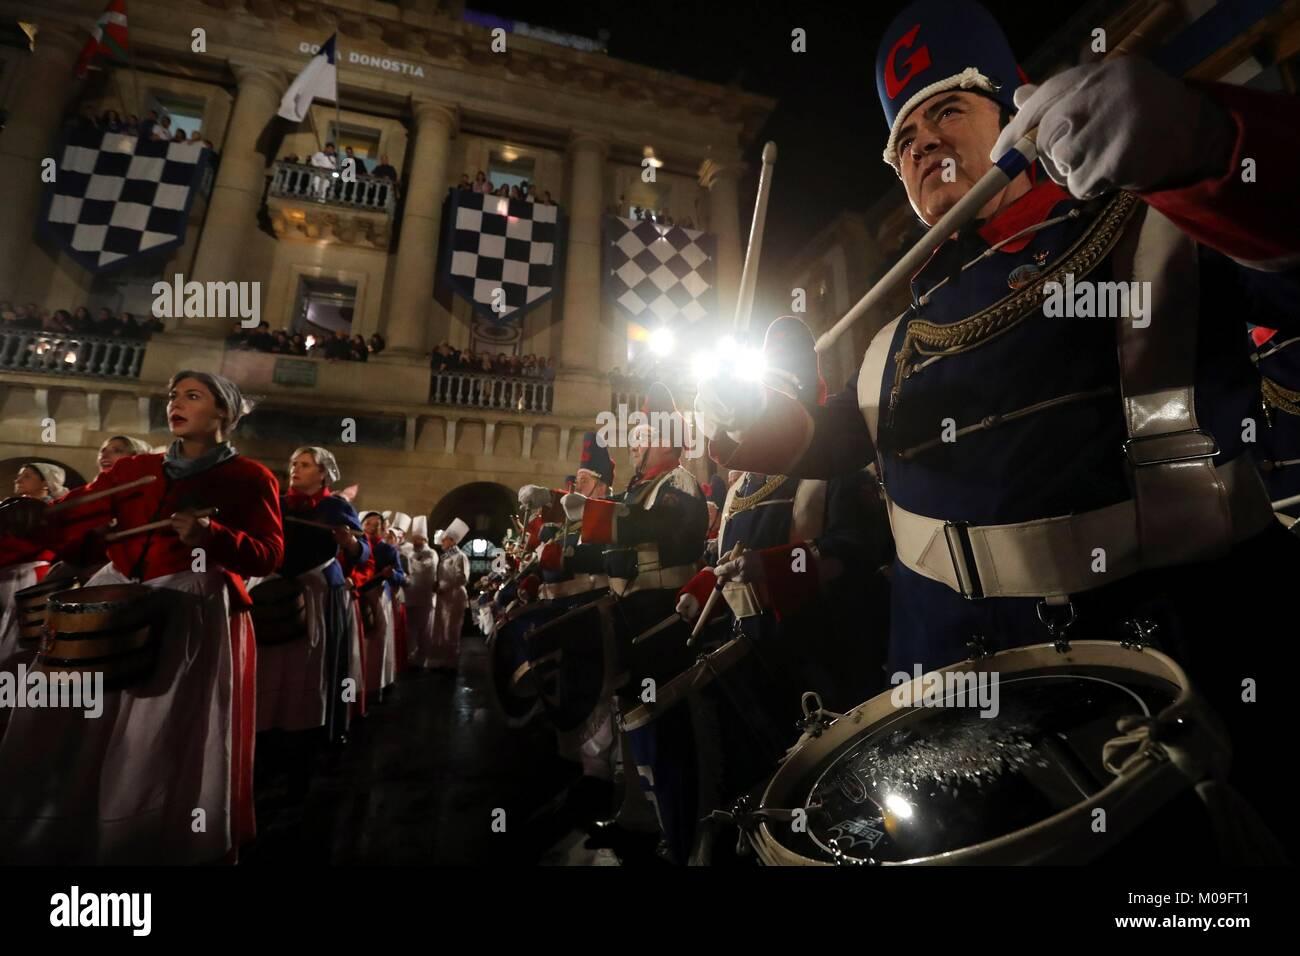 Flag raising ceremony during the Big Day of San Sebastian's festivities in San Sebastian, Basque Country, Spain, - Stock Image